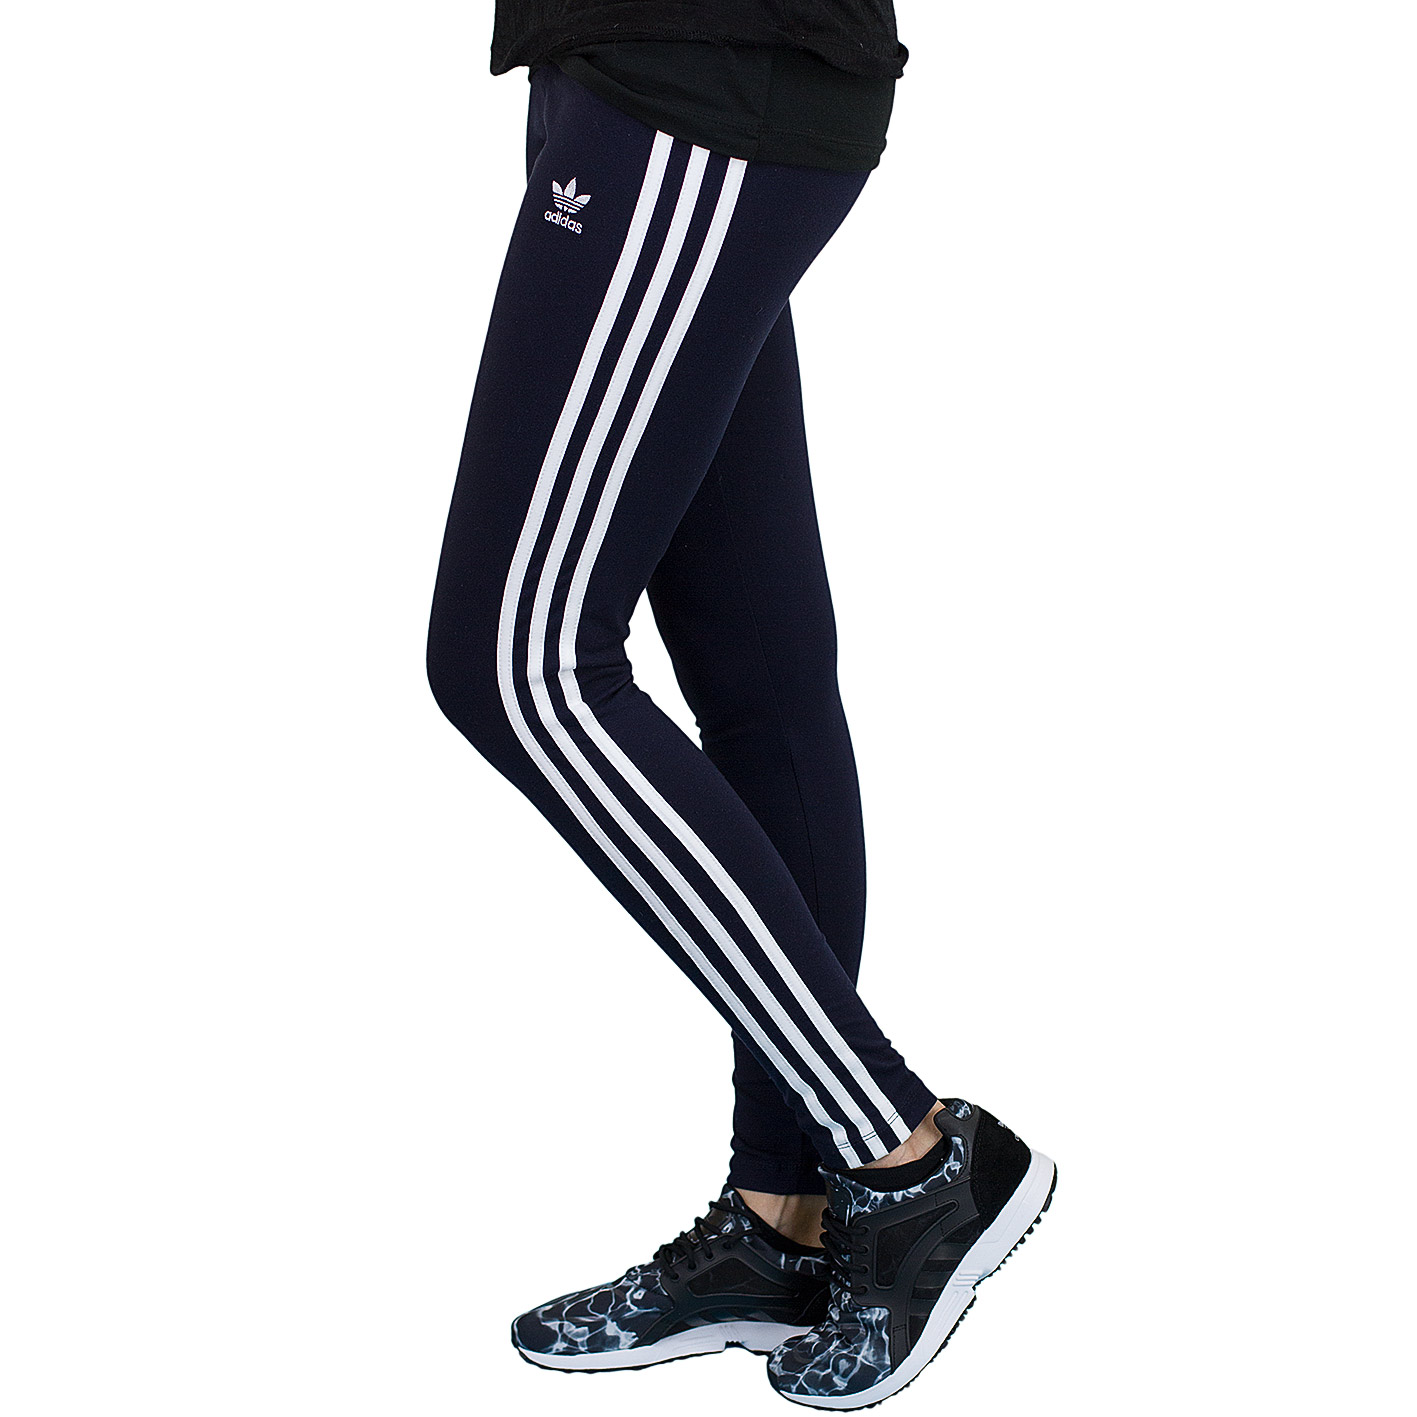 low cost best sale new products Adidas Leggings 3 Stripes dunkelblau/weiß